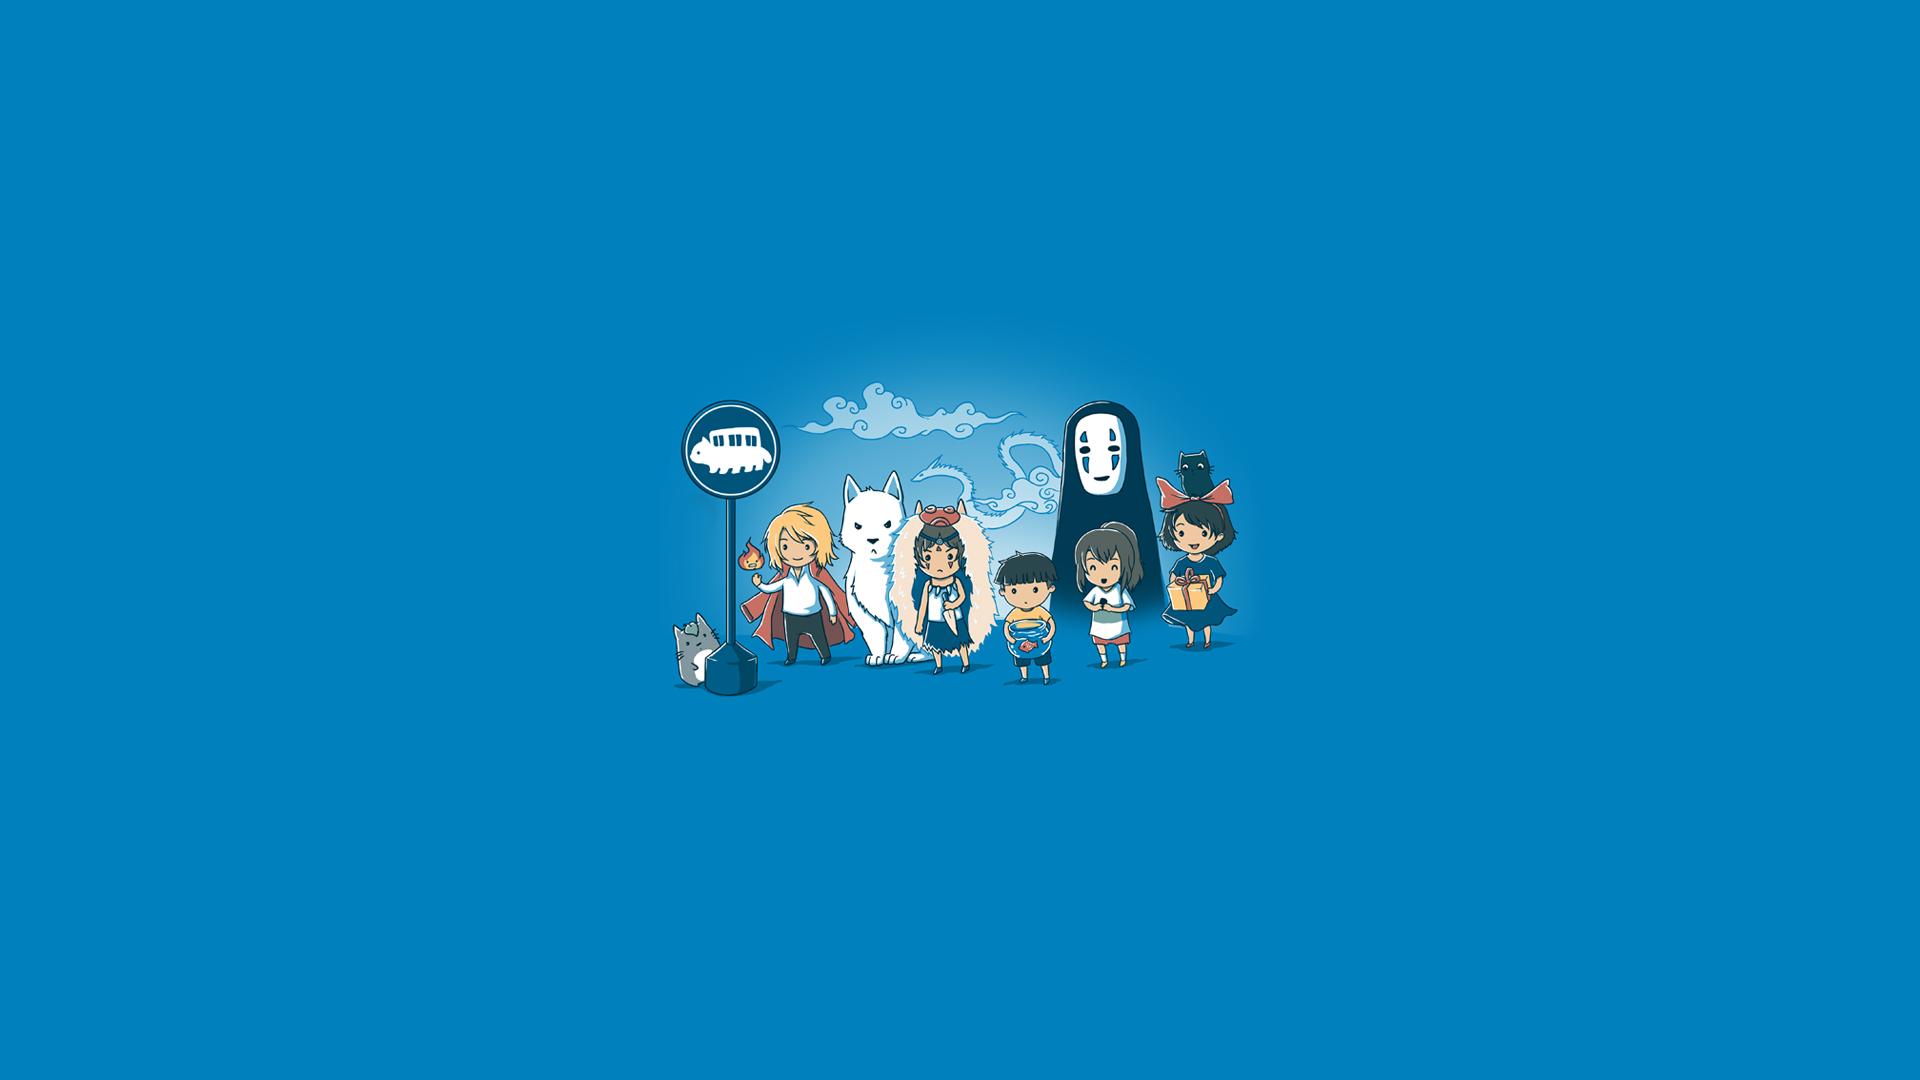 anime-Studio-Ghibli-My-Neighbor-Totoro-Totoro-Howl-s-Moving-Castle-Princess-Mononoke-Sp-wallpaper-wp36016